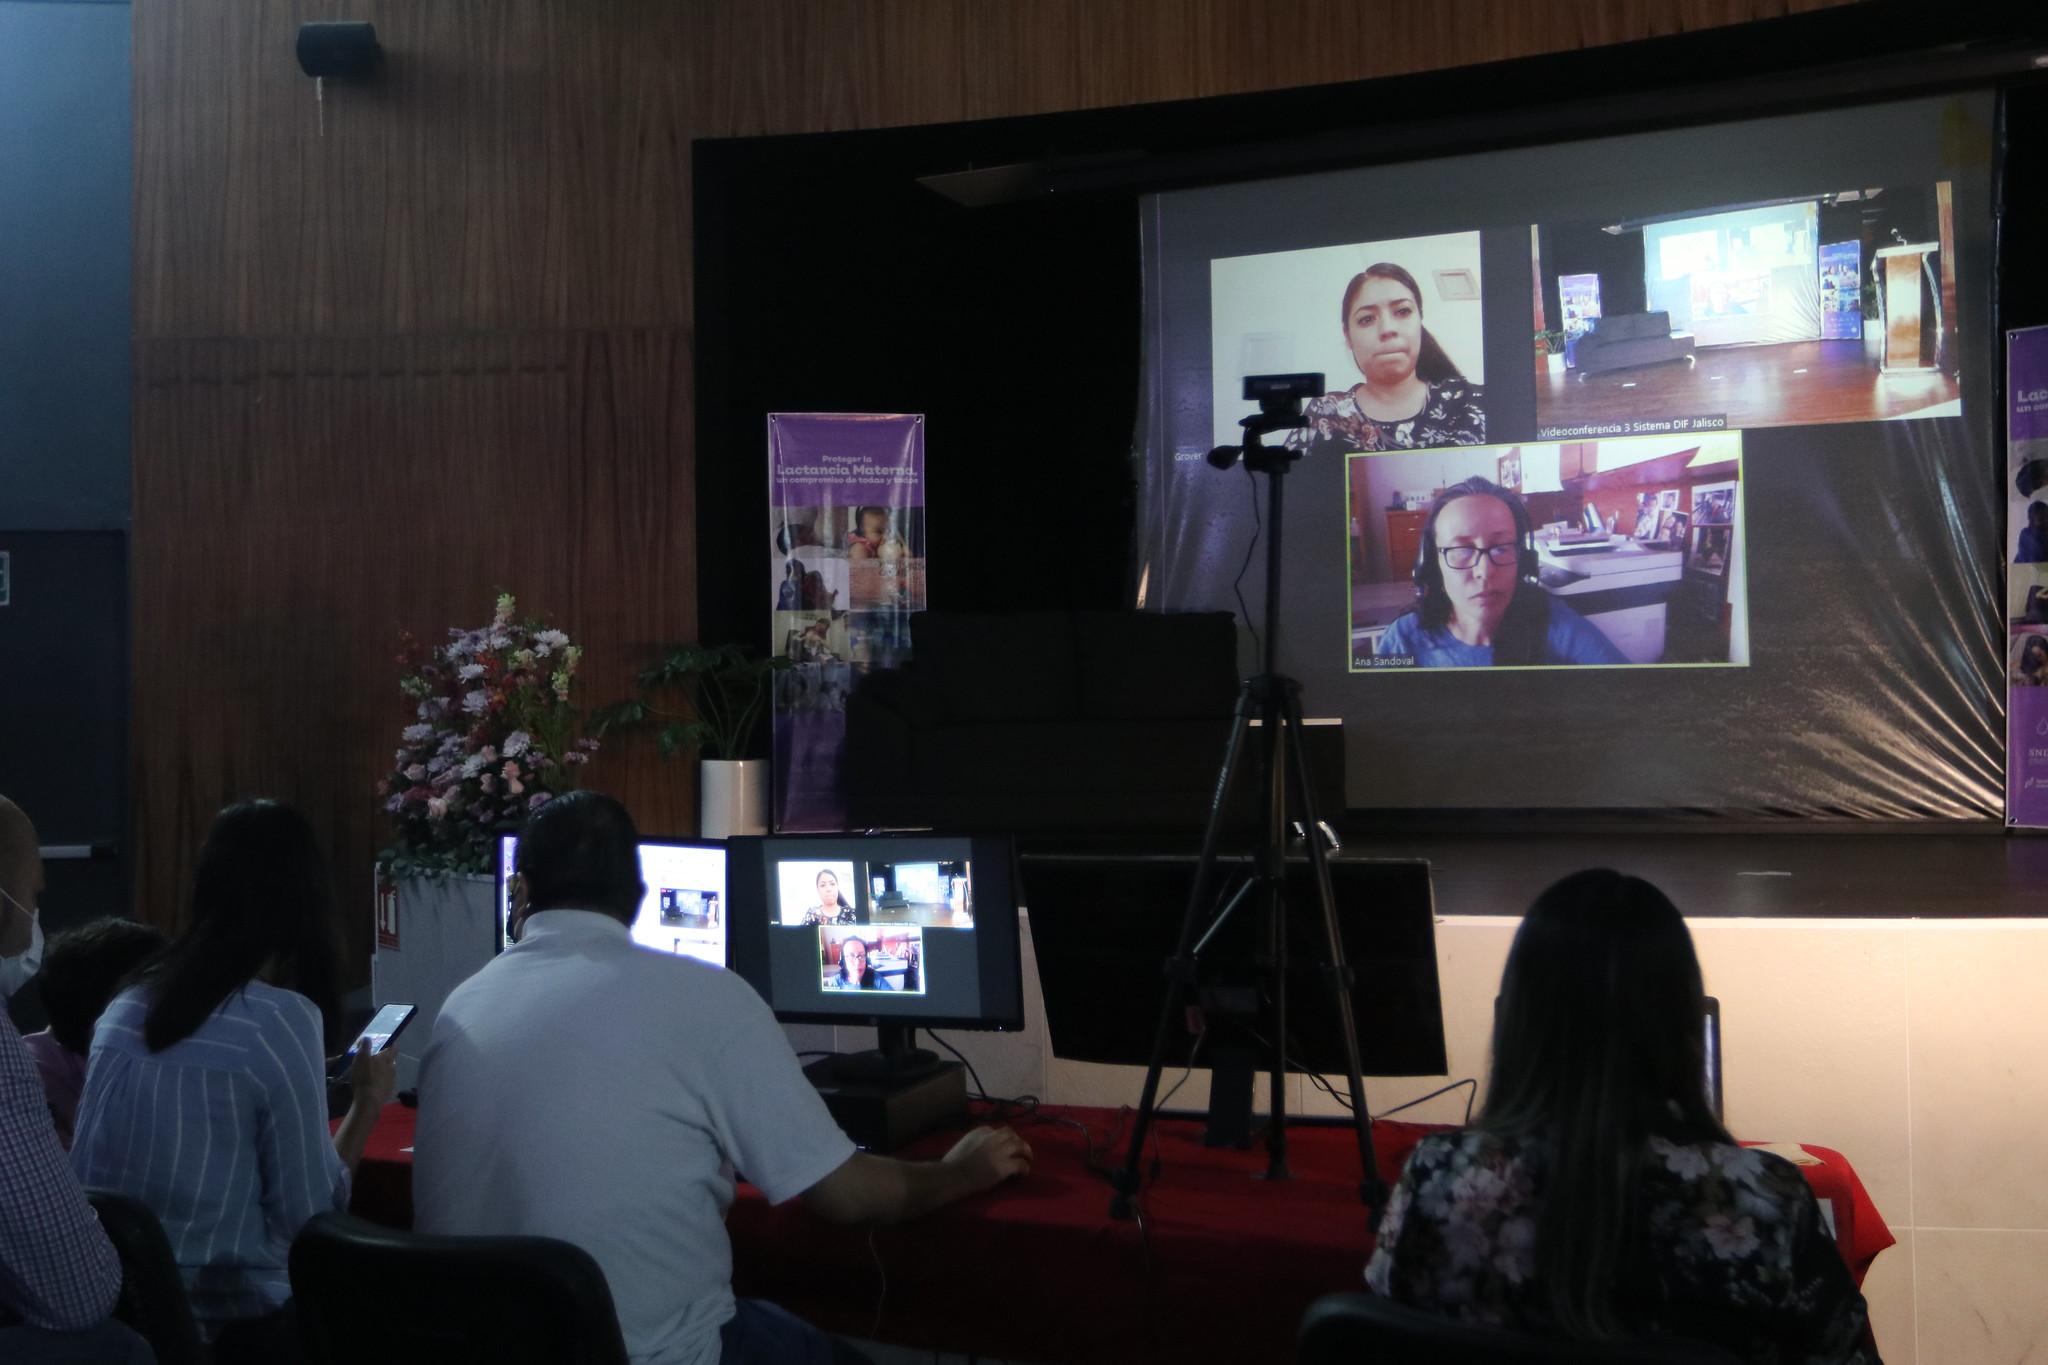 Conferencia en DIF Jalisco, en el marco de la Semana Mundial de la Lactancia Materna 2021.